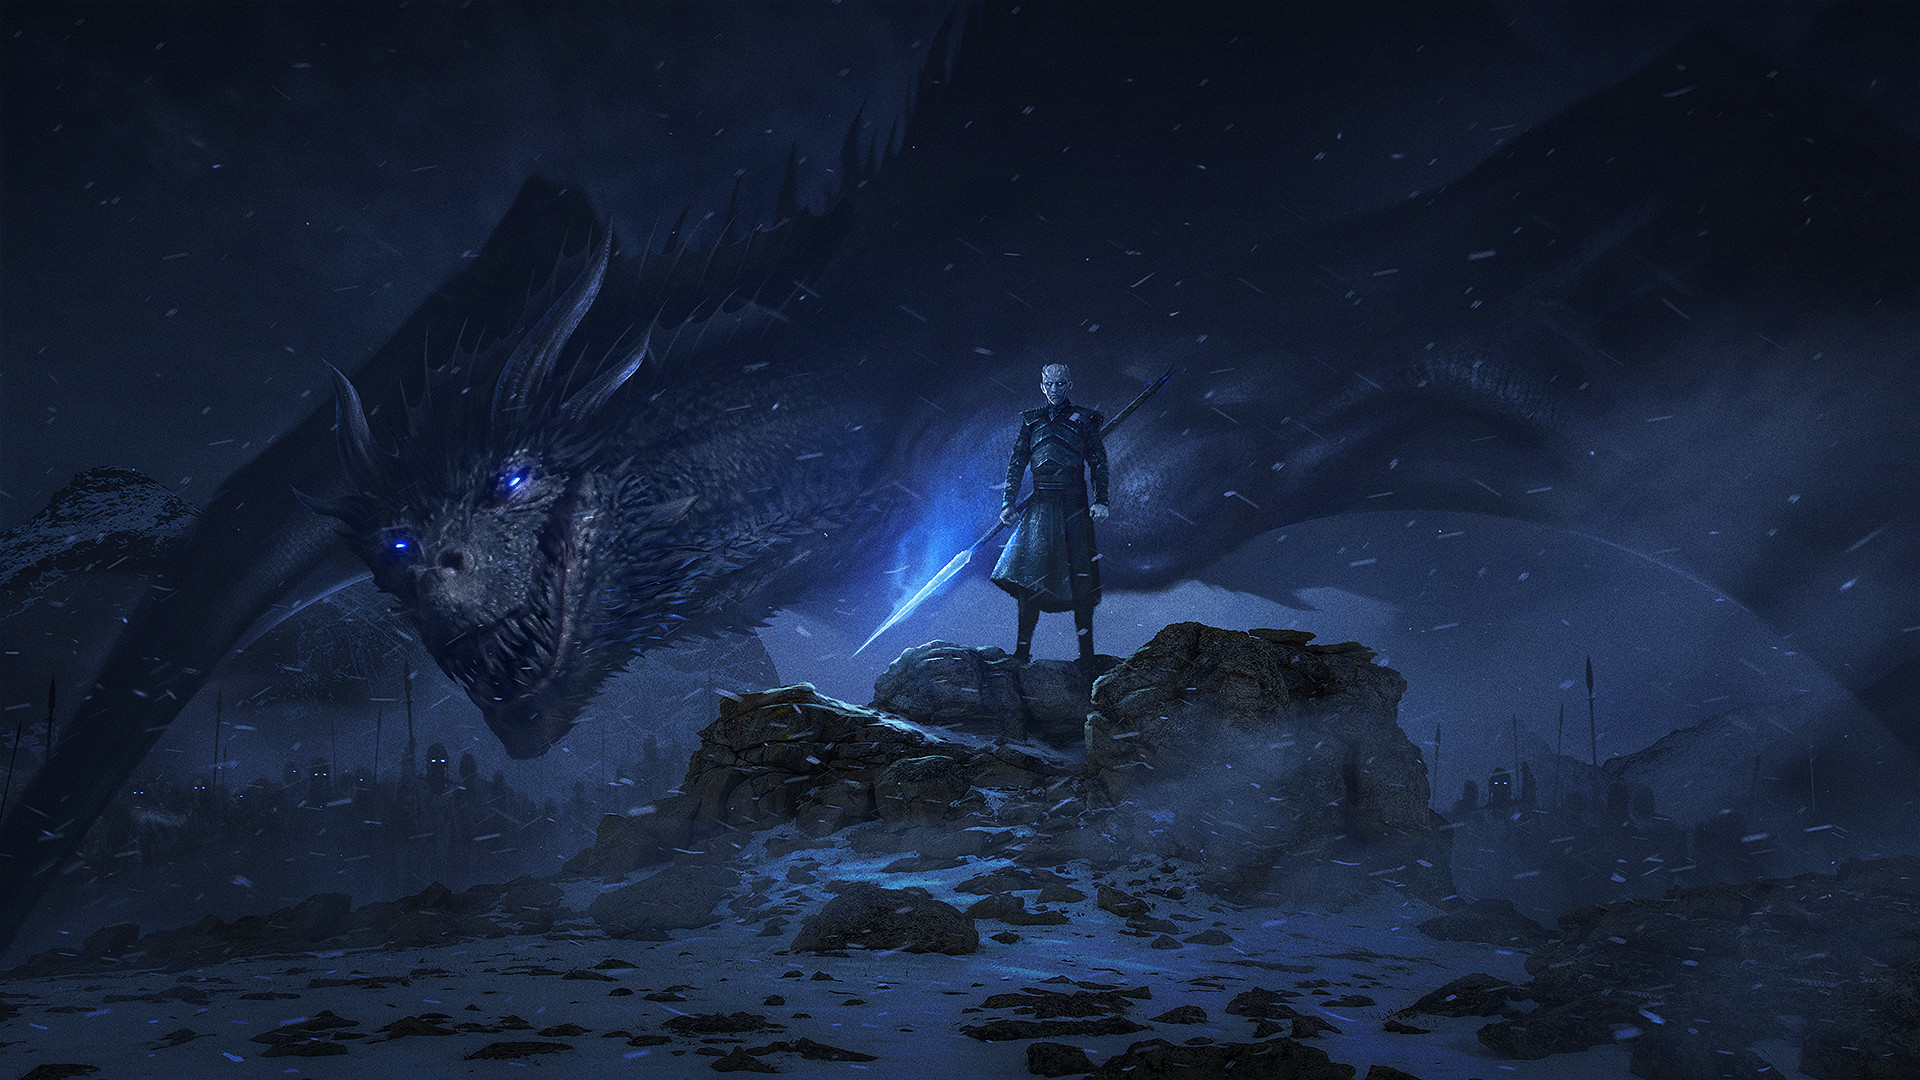 4KHD Wallpaper Of Game Of Thrones Season 8 Season 7   neOadviser 1920x1080